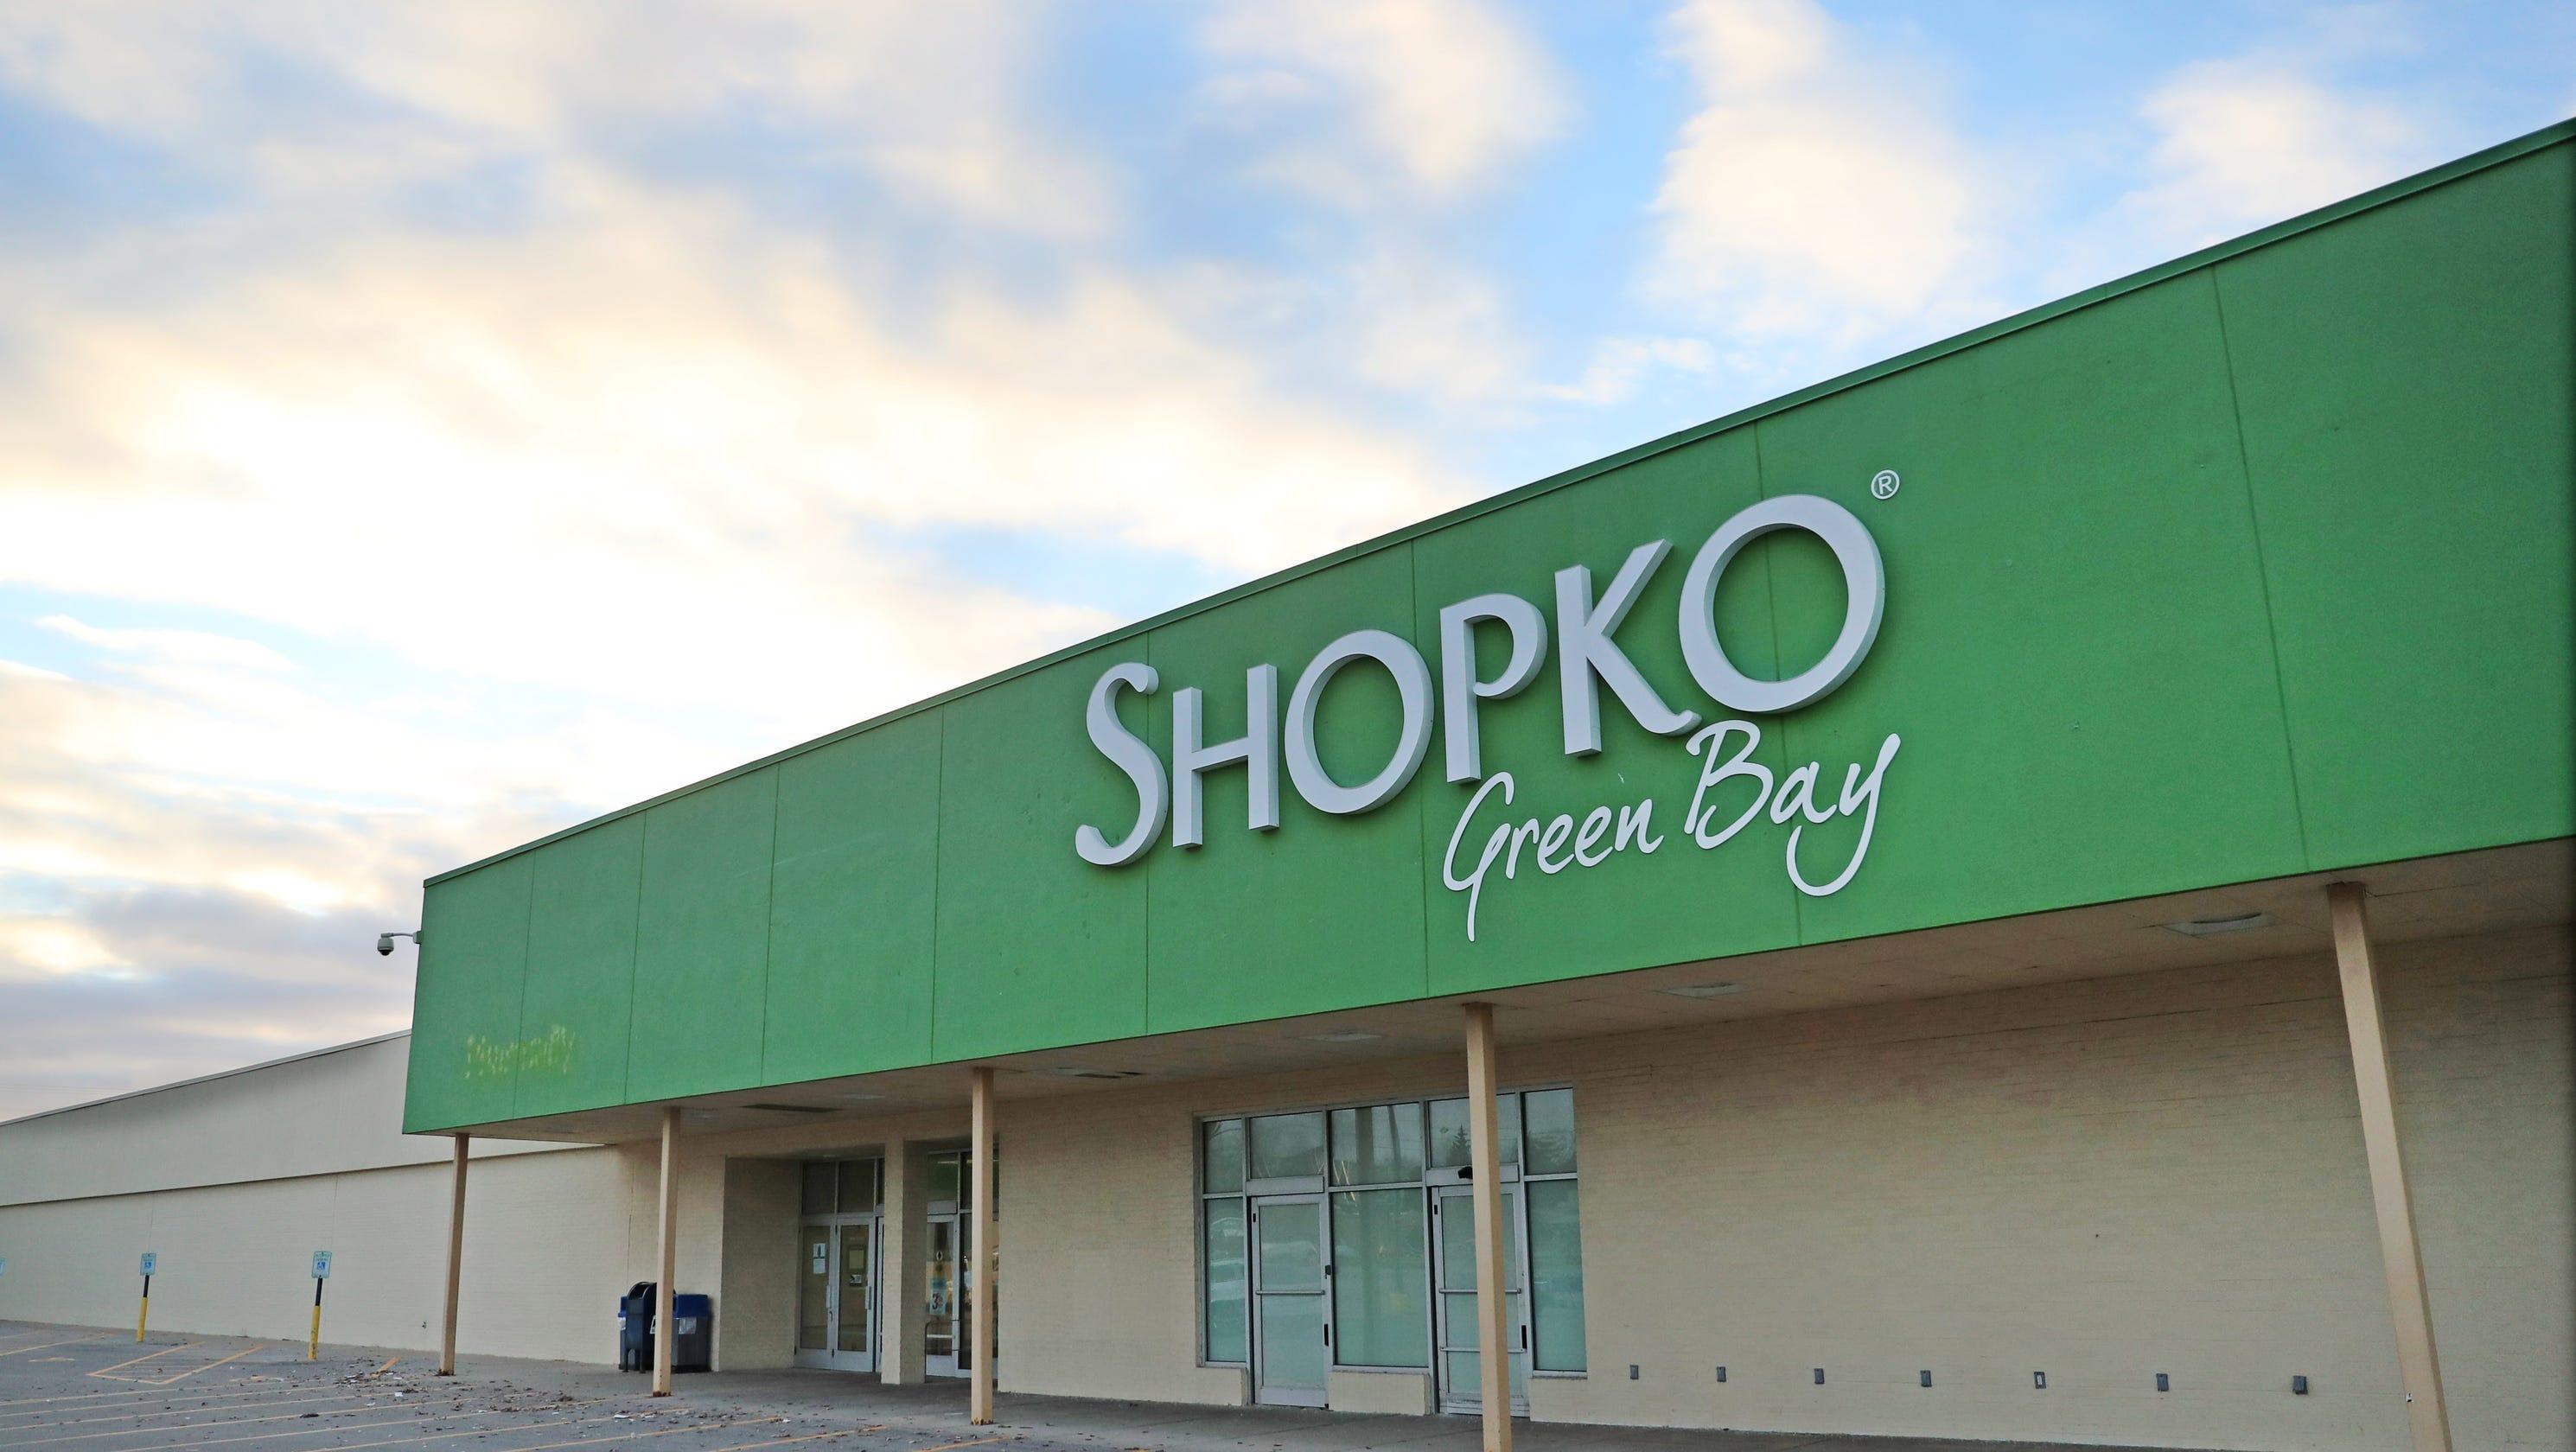 Shopko closing 6 Wisconsin stores